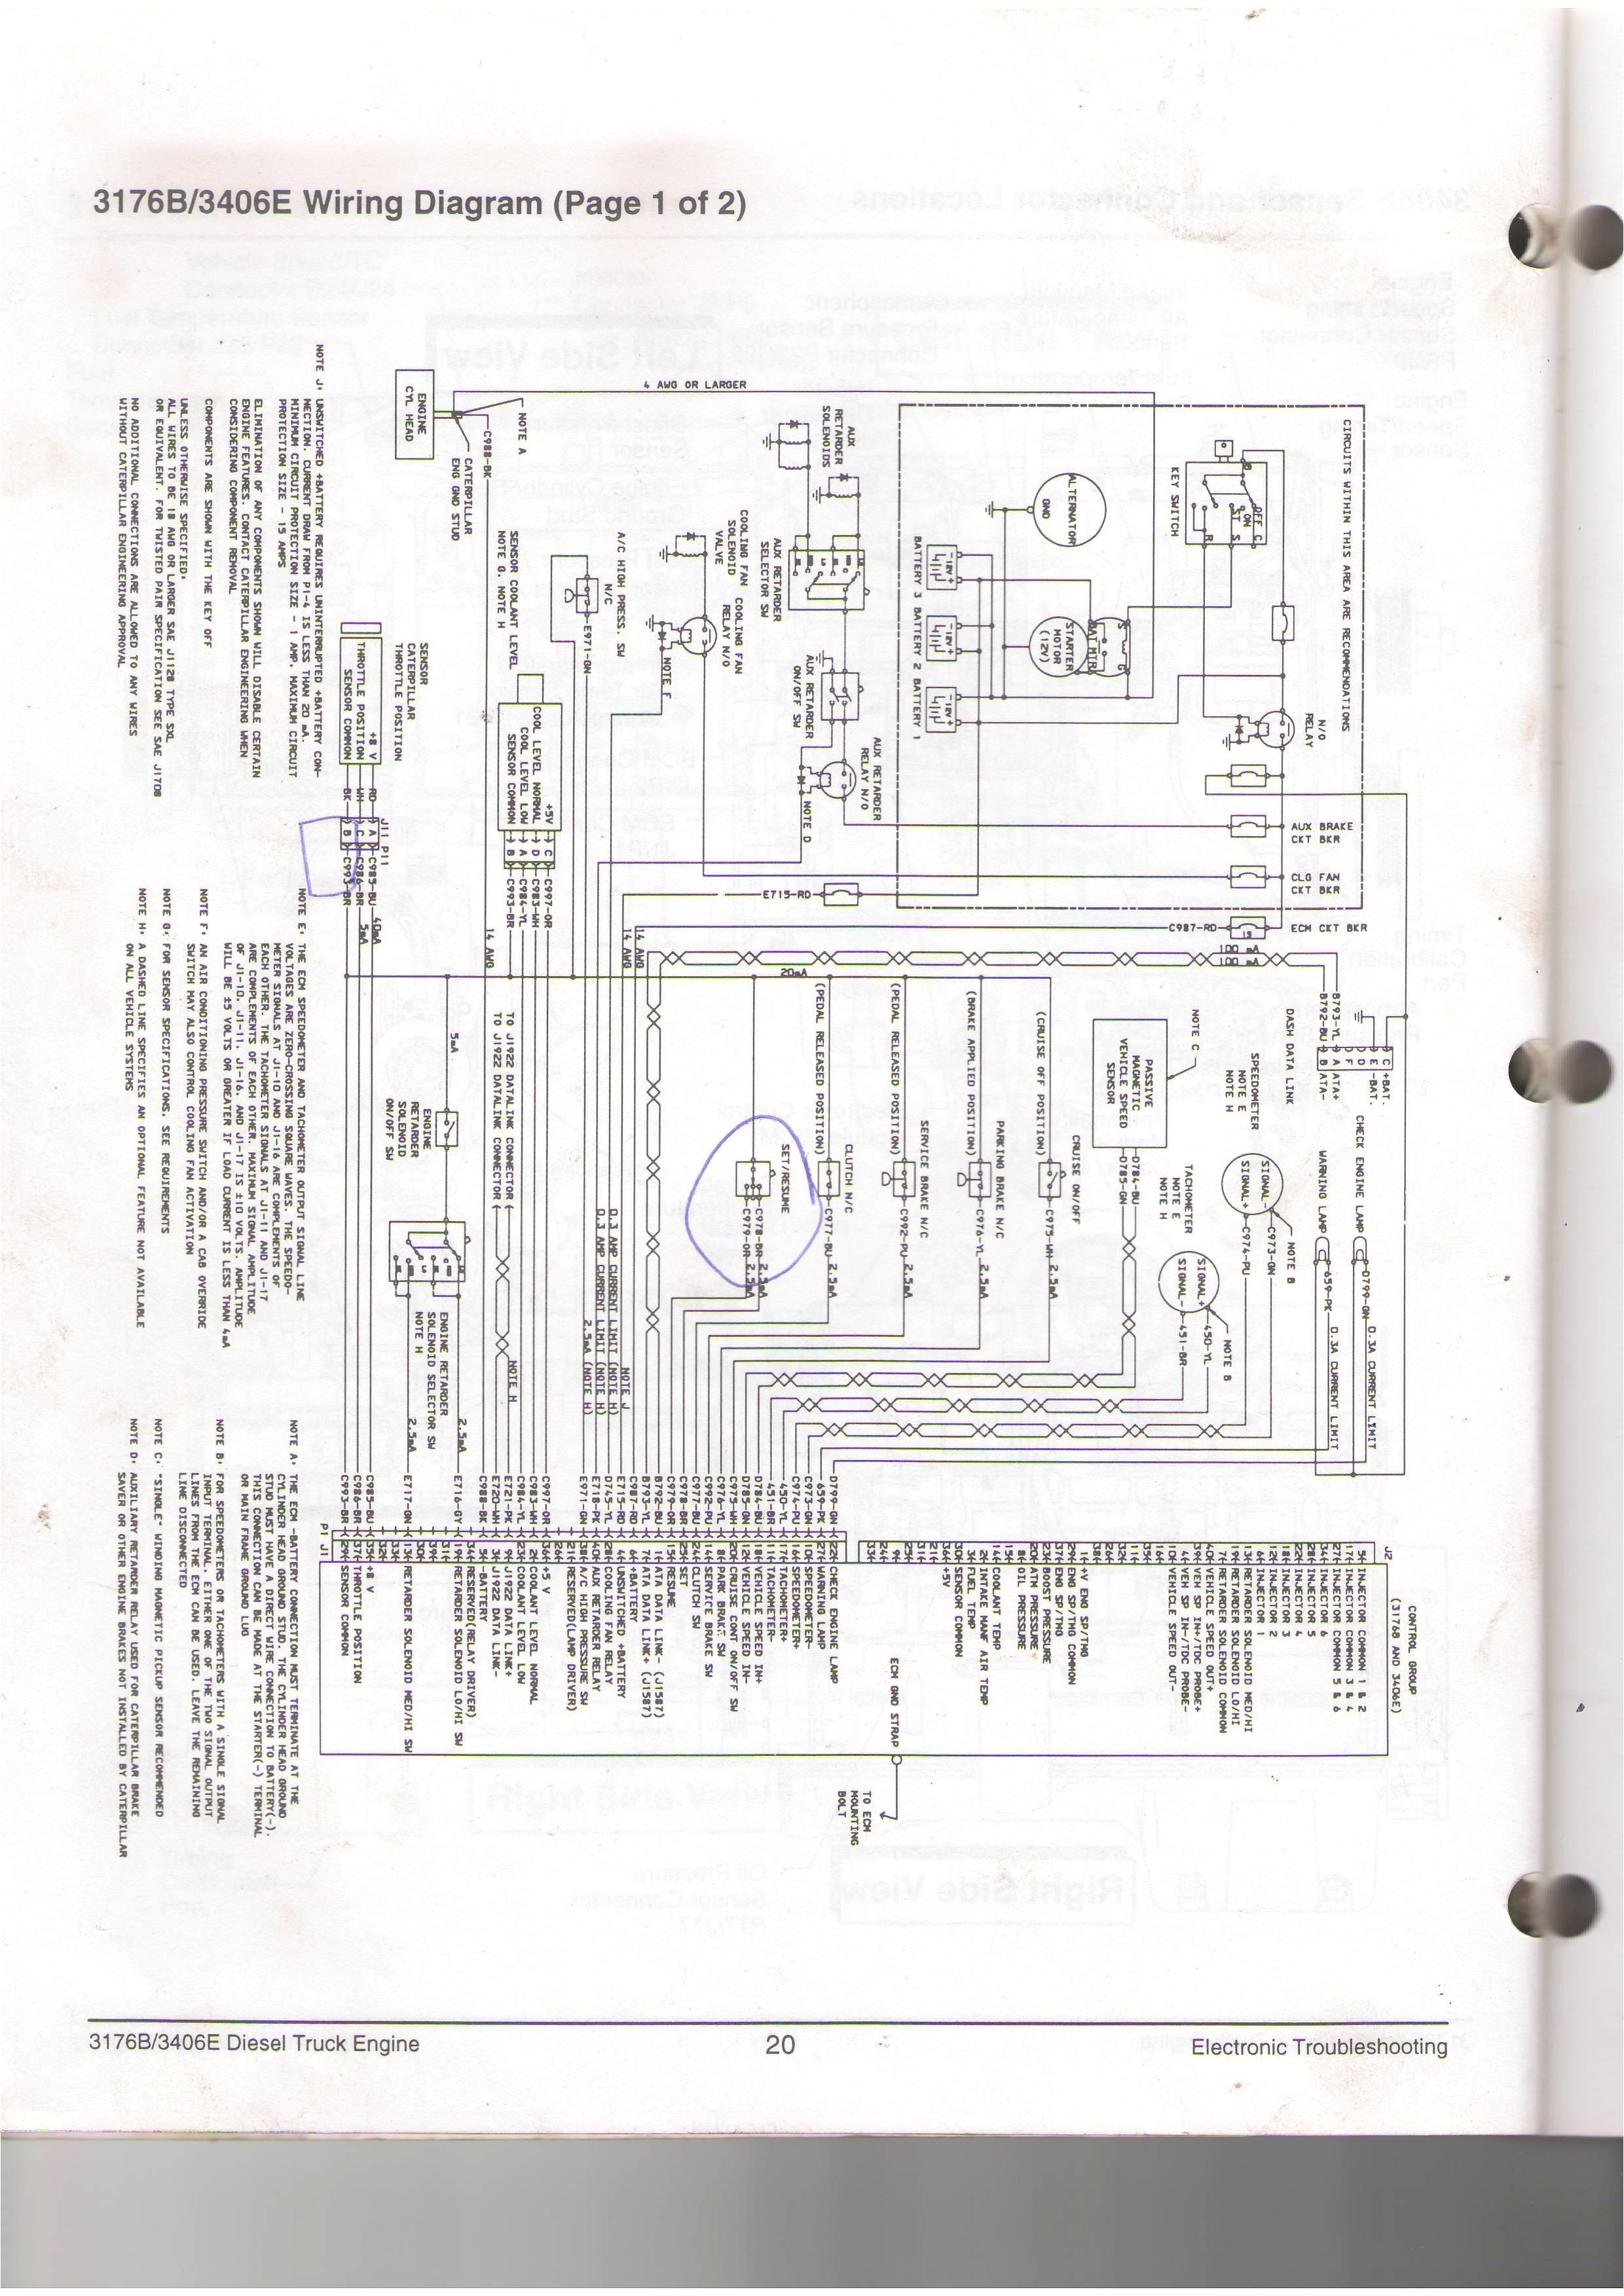 cat ecm pin wiring diagram for 277b search wiring diagramcat ecm pin wiring diagram for 277b